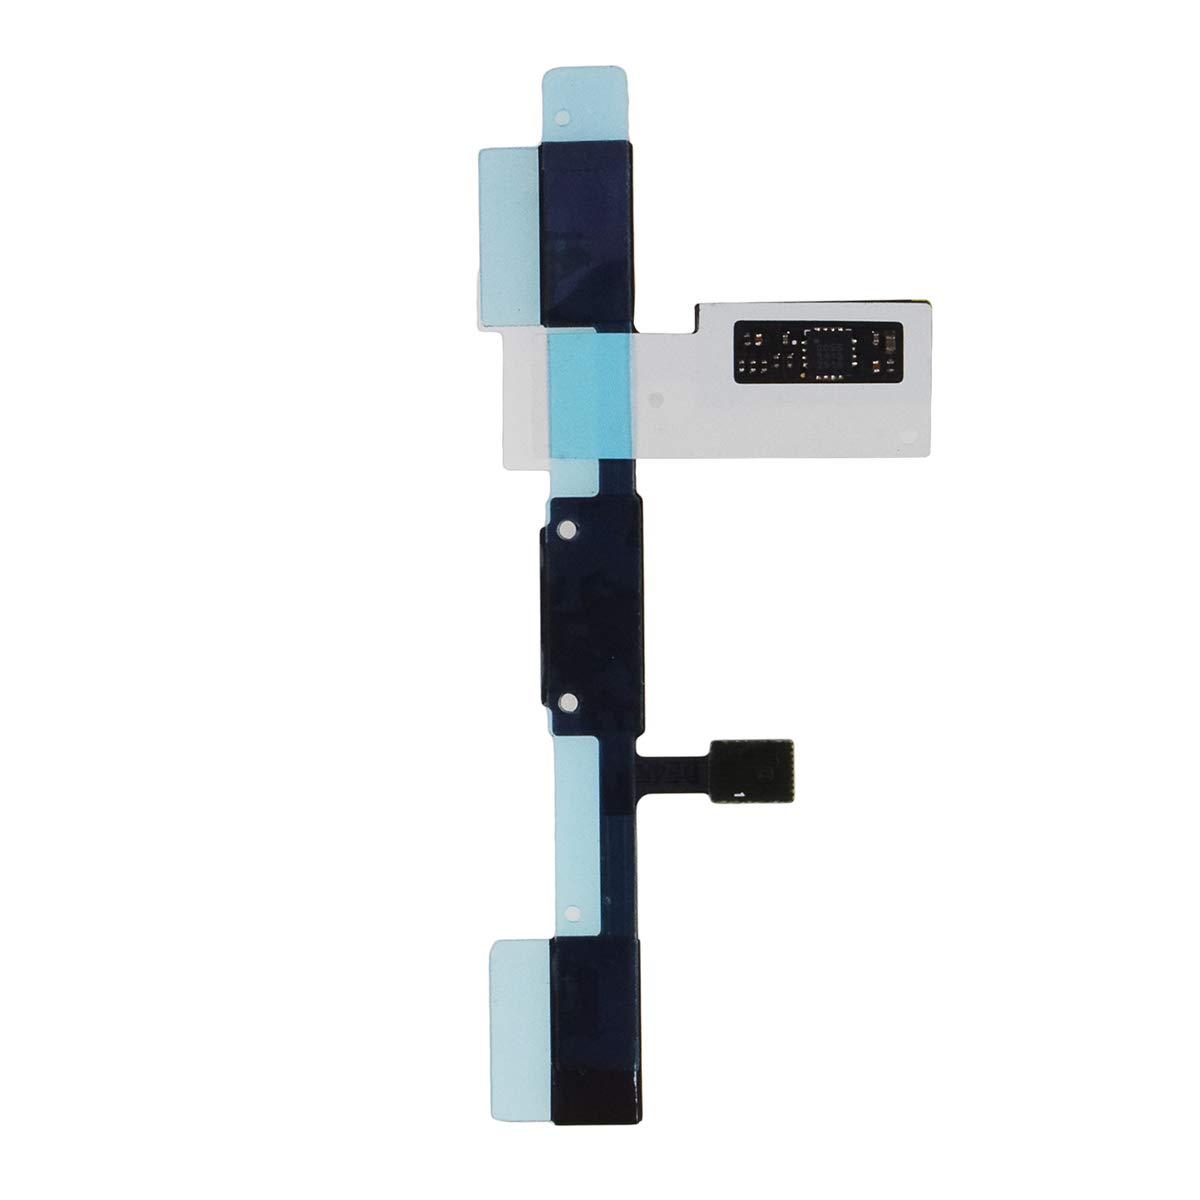 Cable Flex Boton Home para Samsung Galaxy Tab S 8.4 LTE